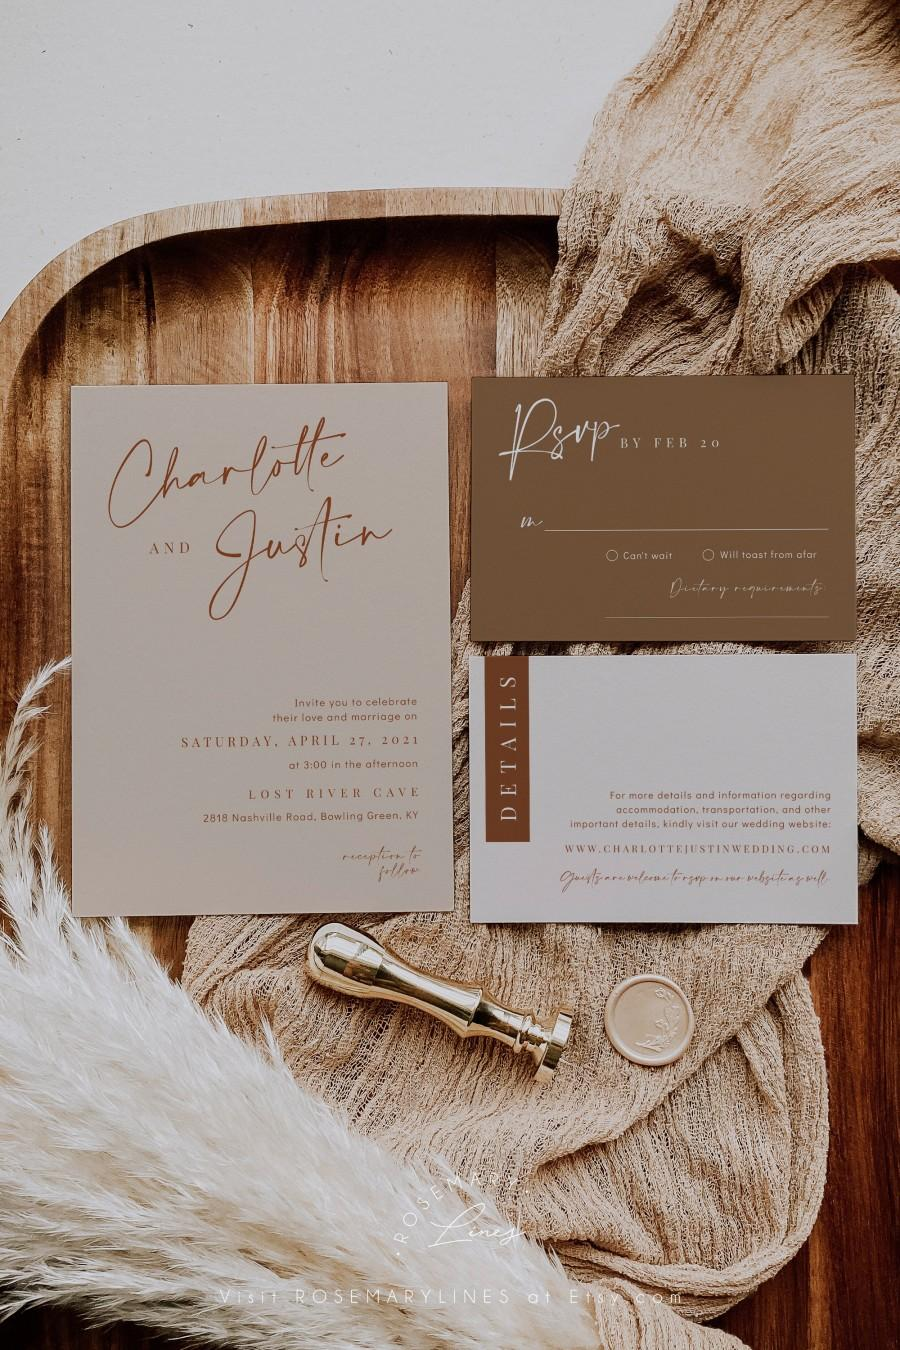 Wedding - Desert wedding invitation template, boho wedding invitations, minimal earthy bohemian wedding invite set, beige terracotta earth tones #134